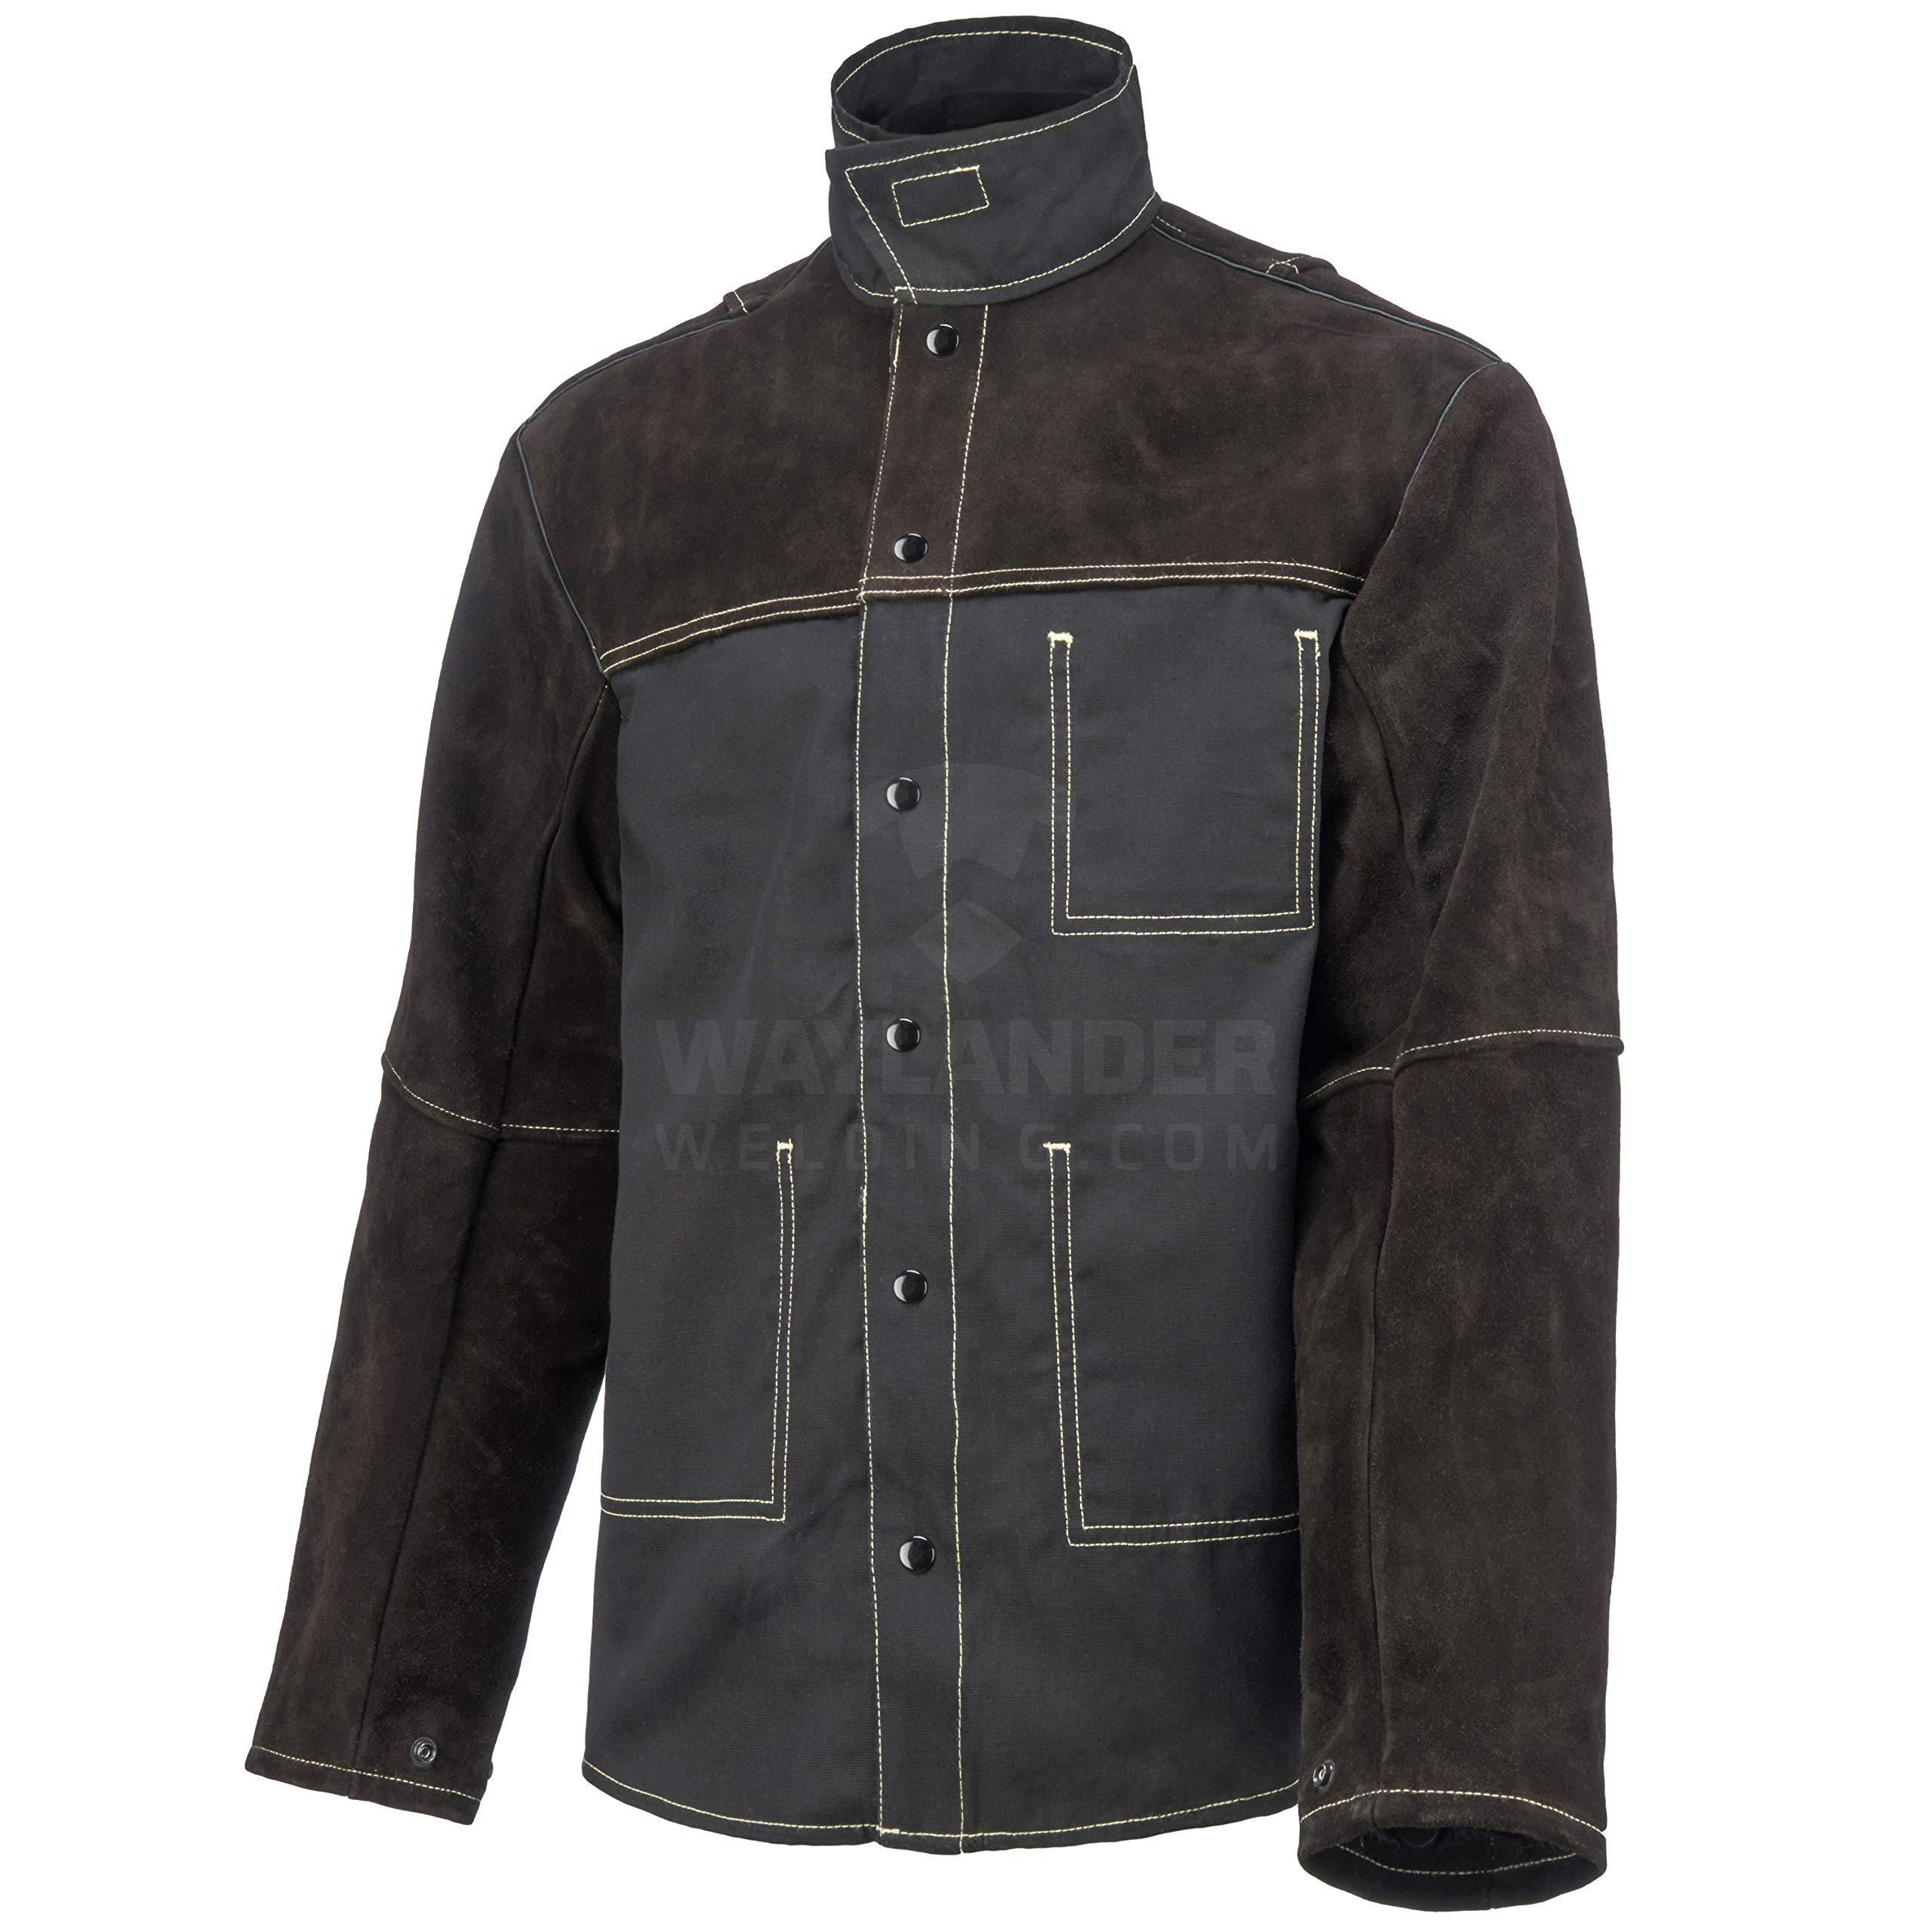 Waylander Welding Jacket Large Split Leather Heat Fire Resistant Cotton Kevlar Stitched Cowhide Dark Brown - L by Waylander